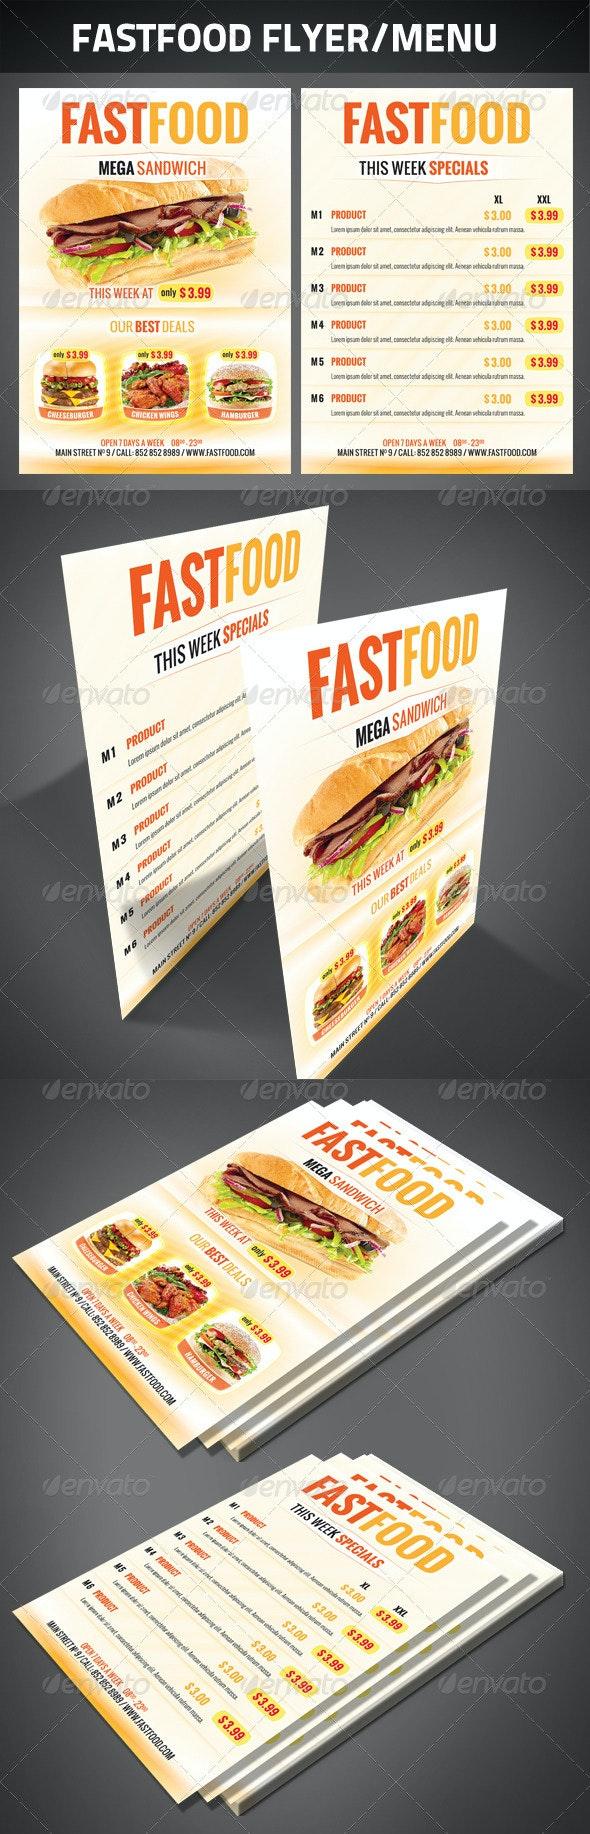 FastFood Flyer - Restaurant Flyers